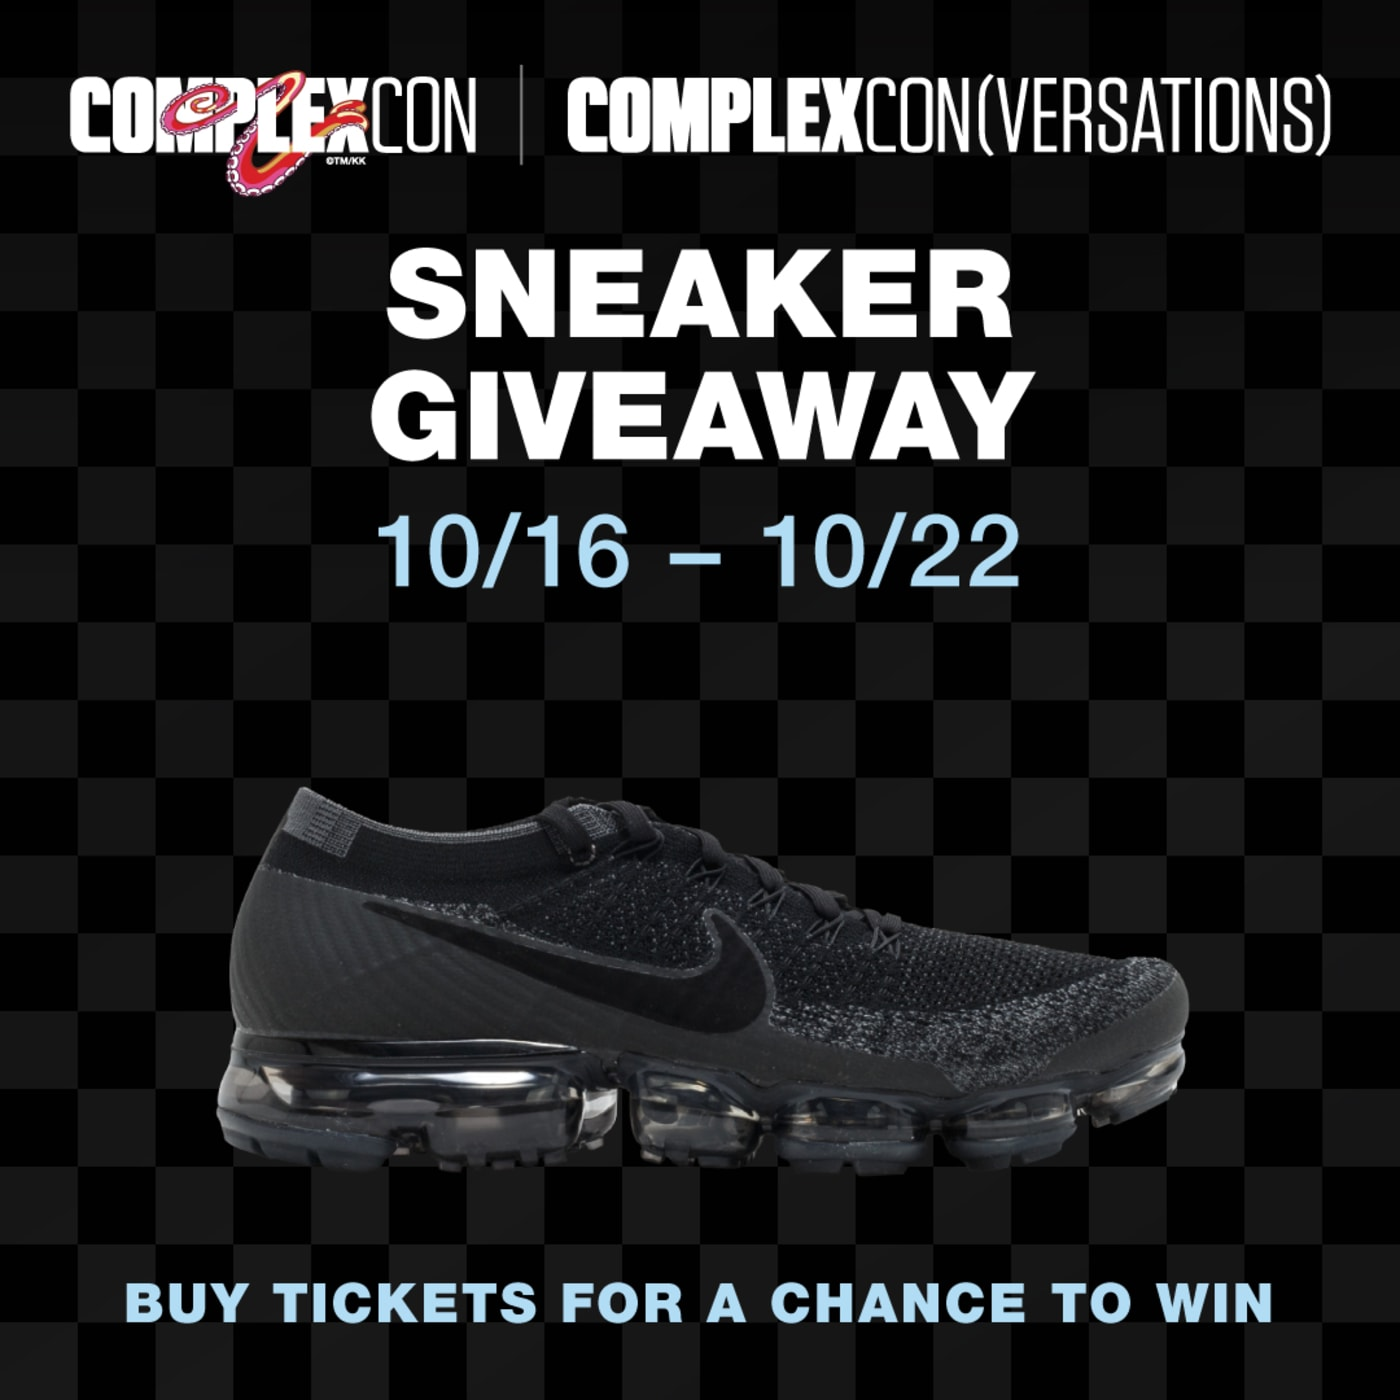 Nike VaporMax Giveaway